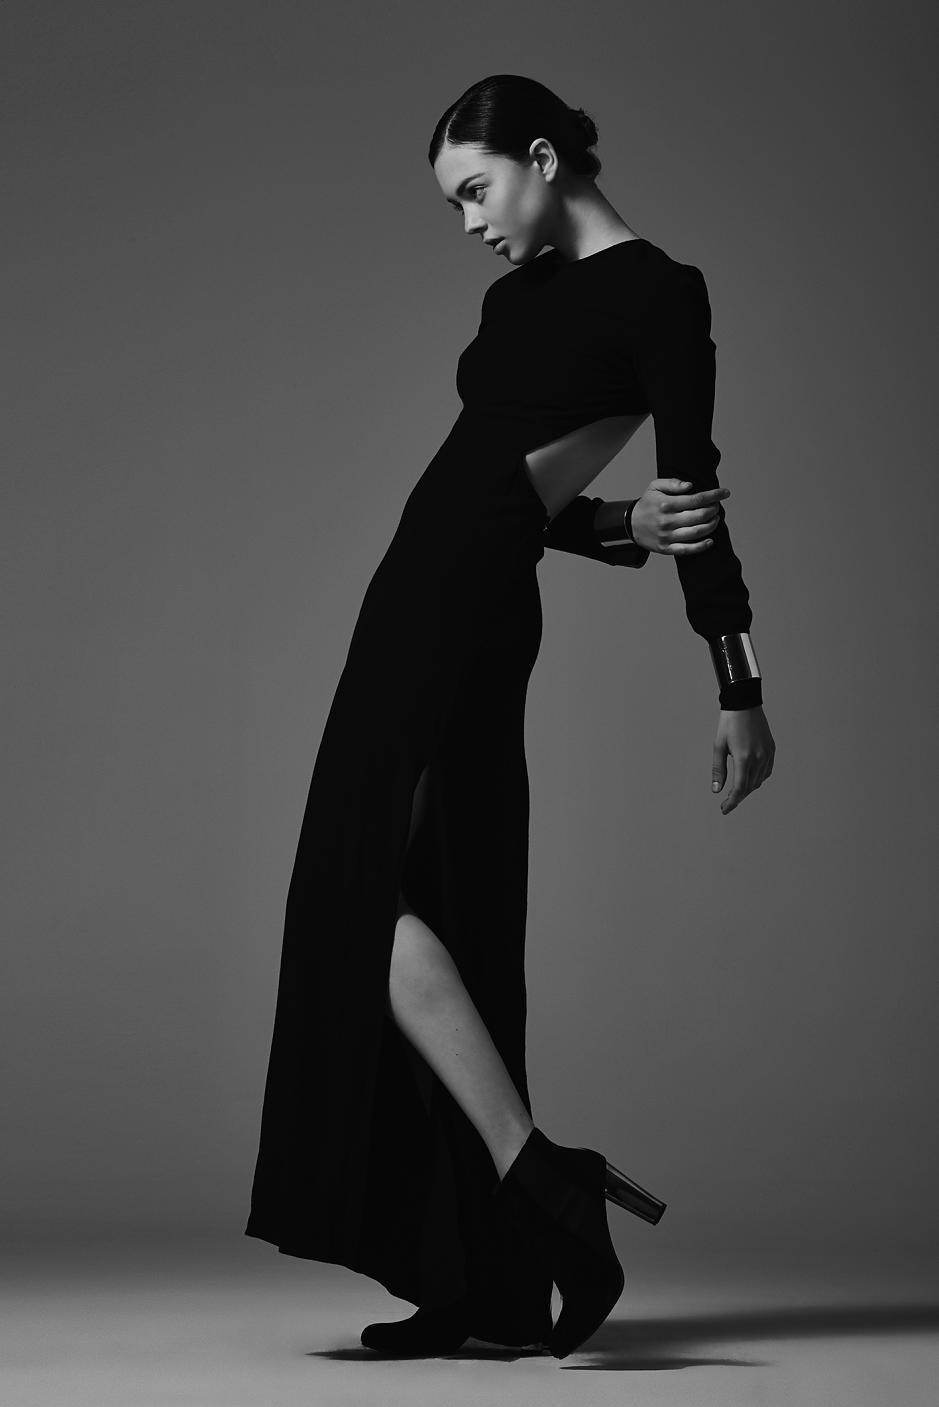 gown pose portrait fashion seamless glamour.jpg